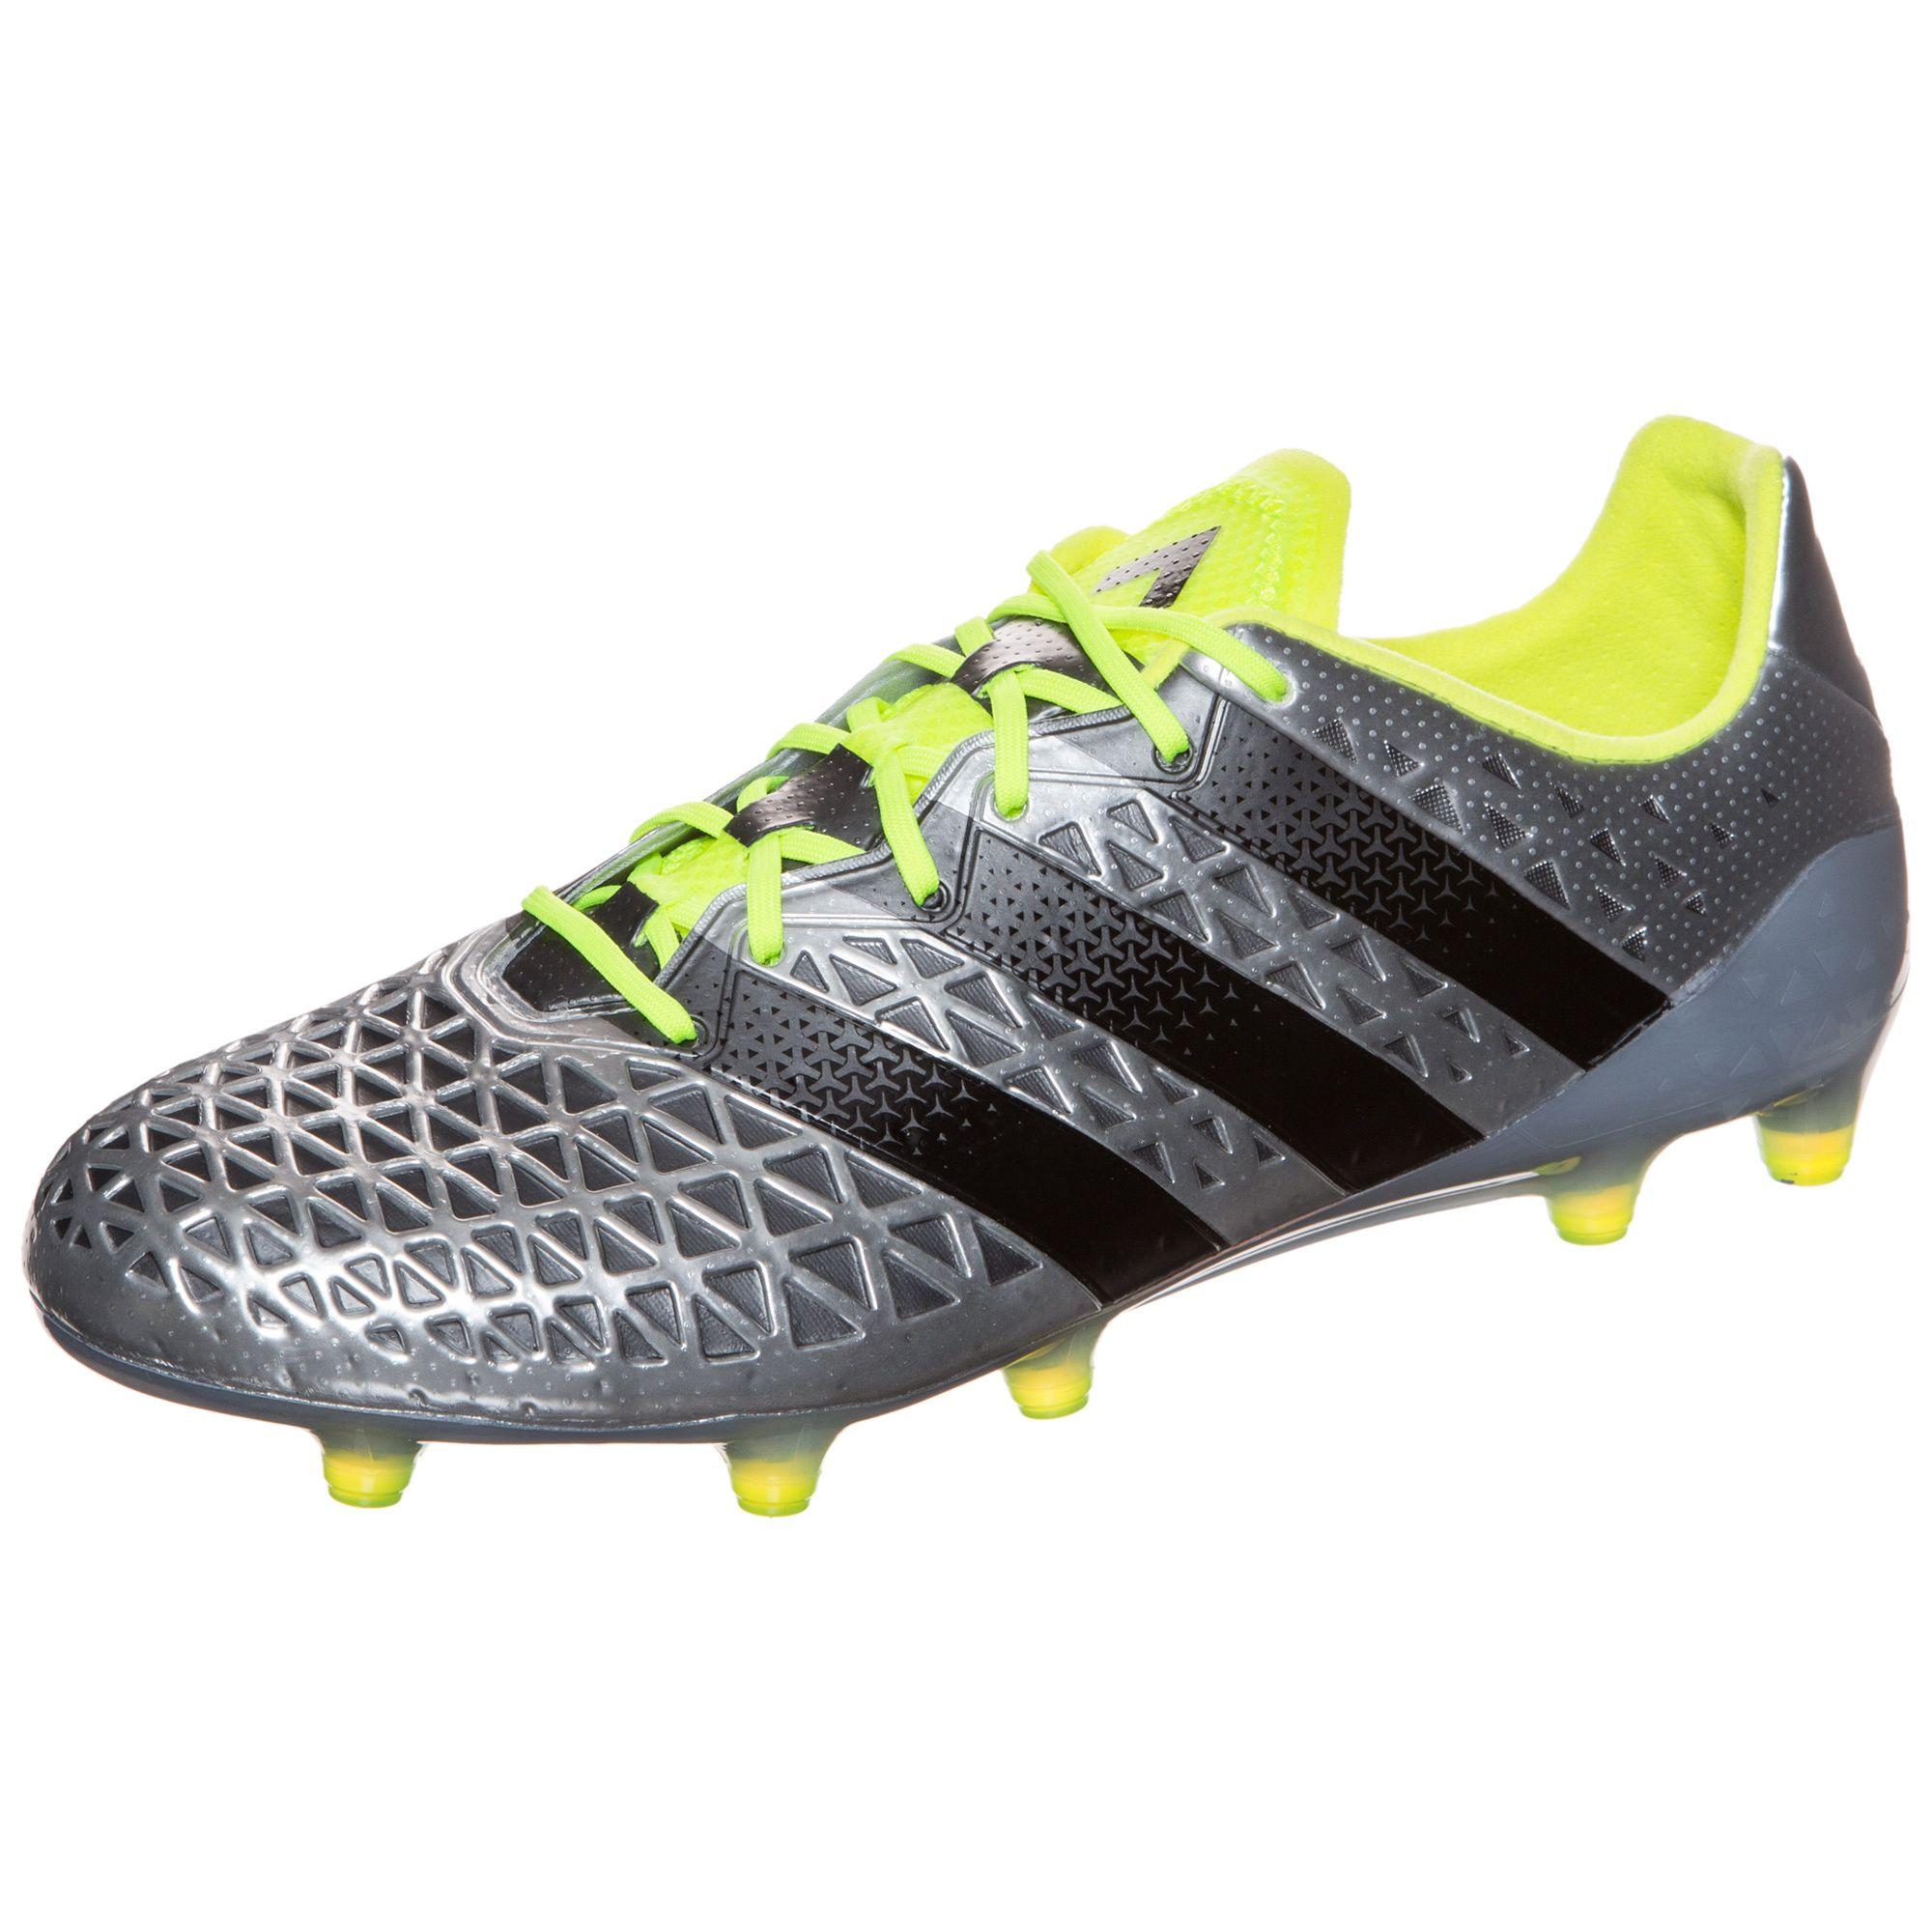 ADIDAS PERFORMANCE adidas Performance ACE 16.1 FG Fußballschuh Herren